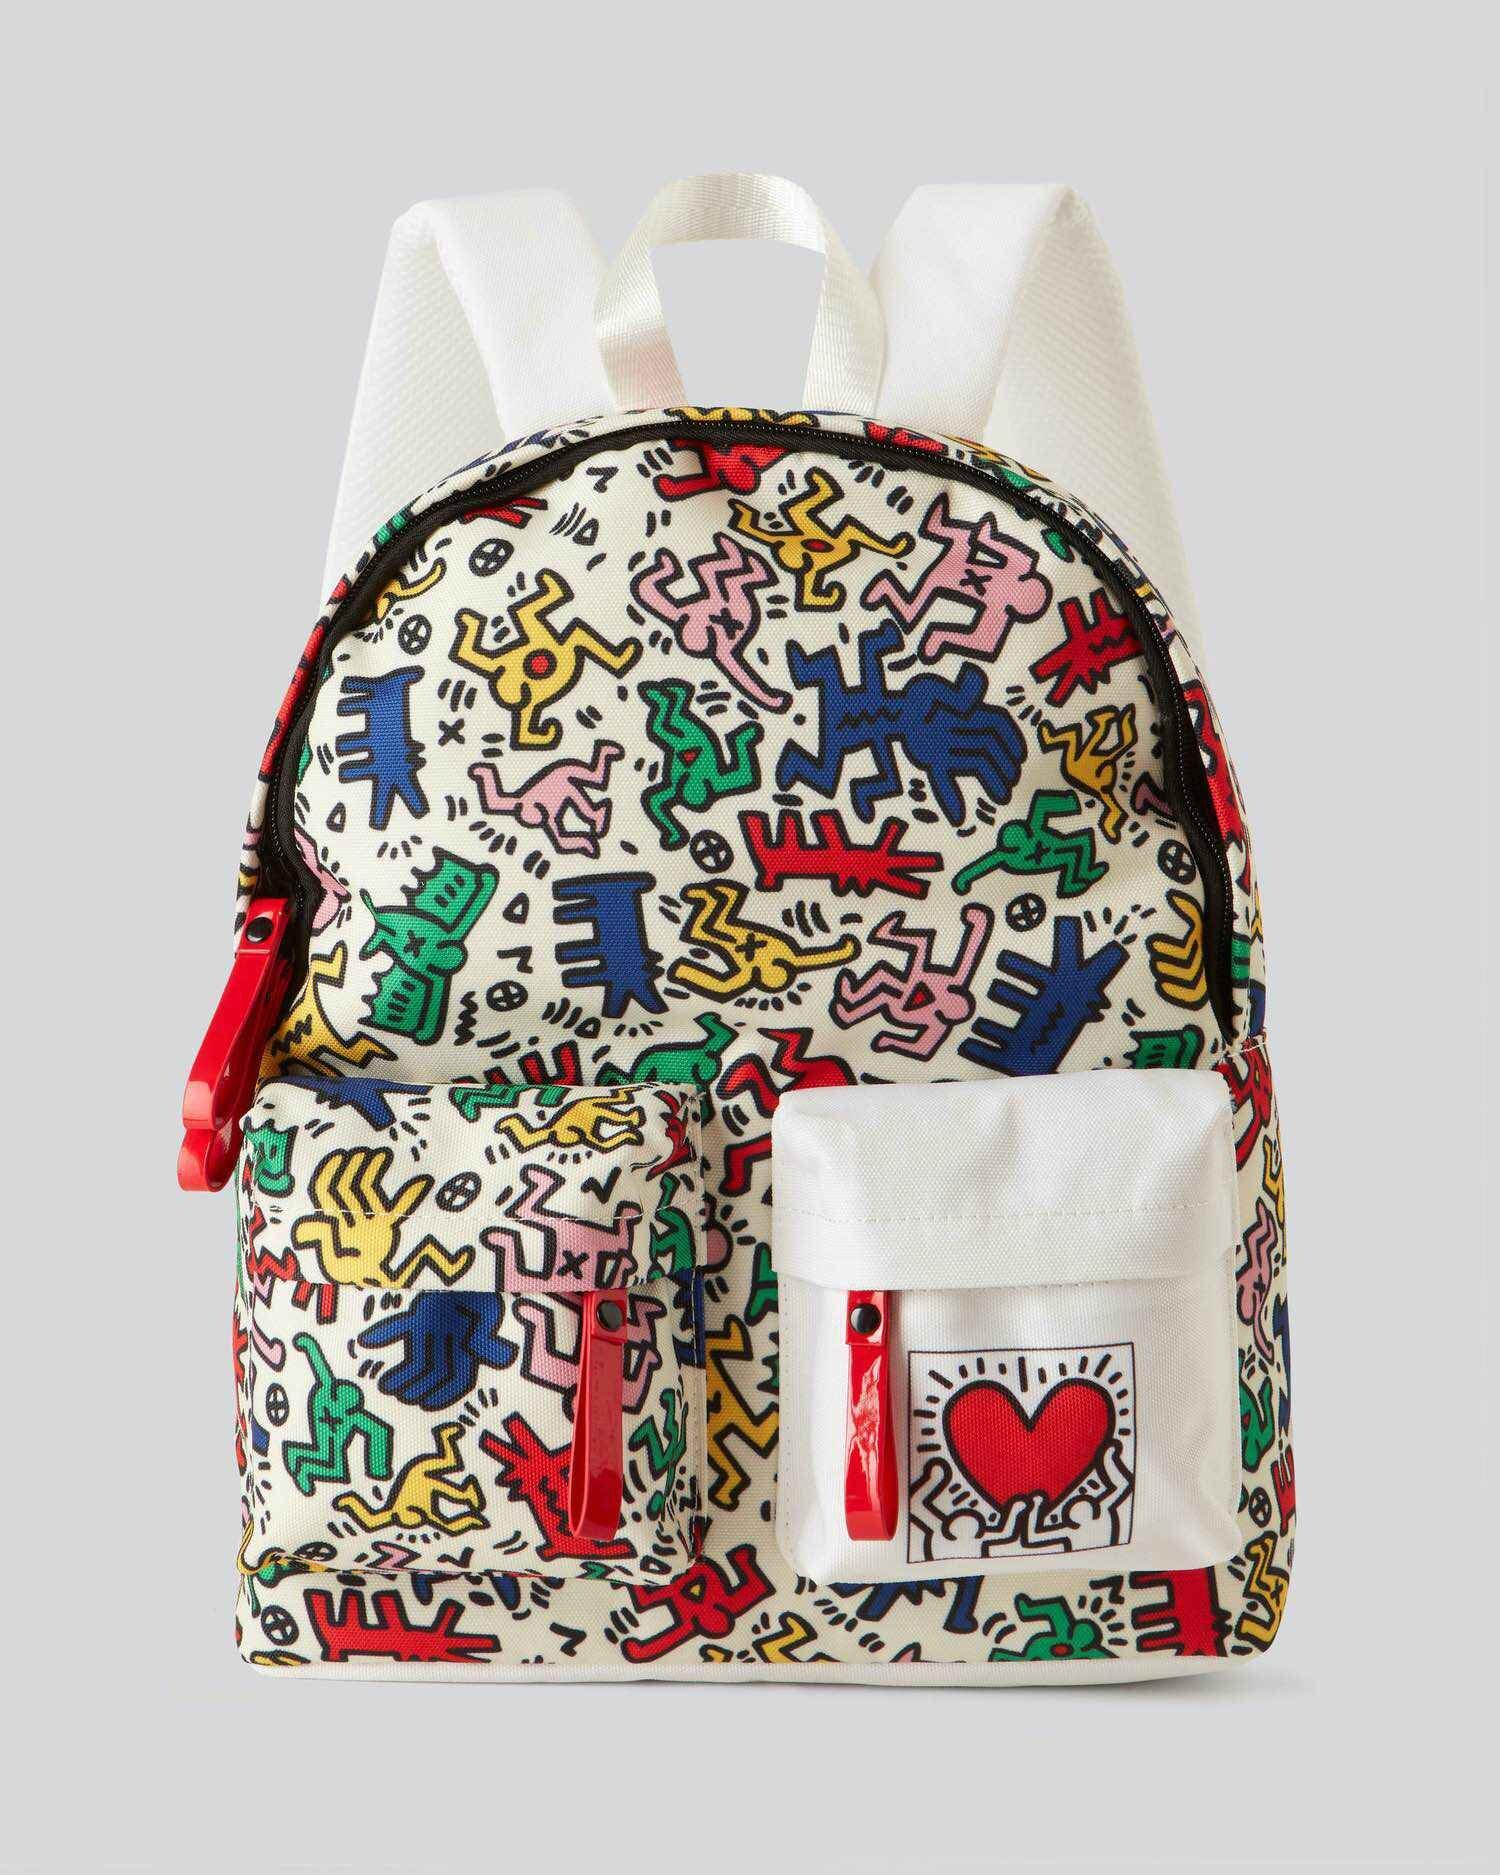 Keith Haring Çizimli Sırt Çantası